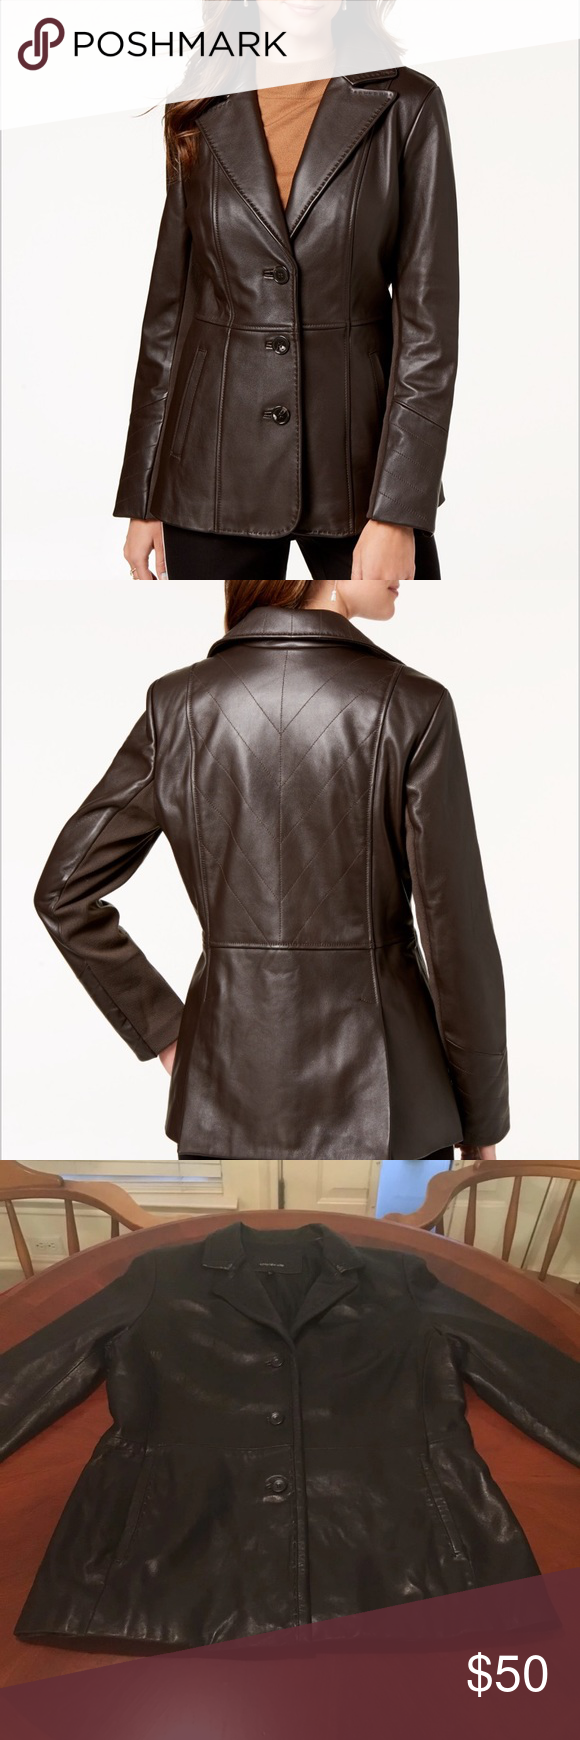 Jones New York VStitched Leather Jacket Large On sale at